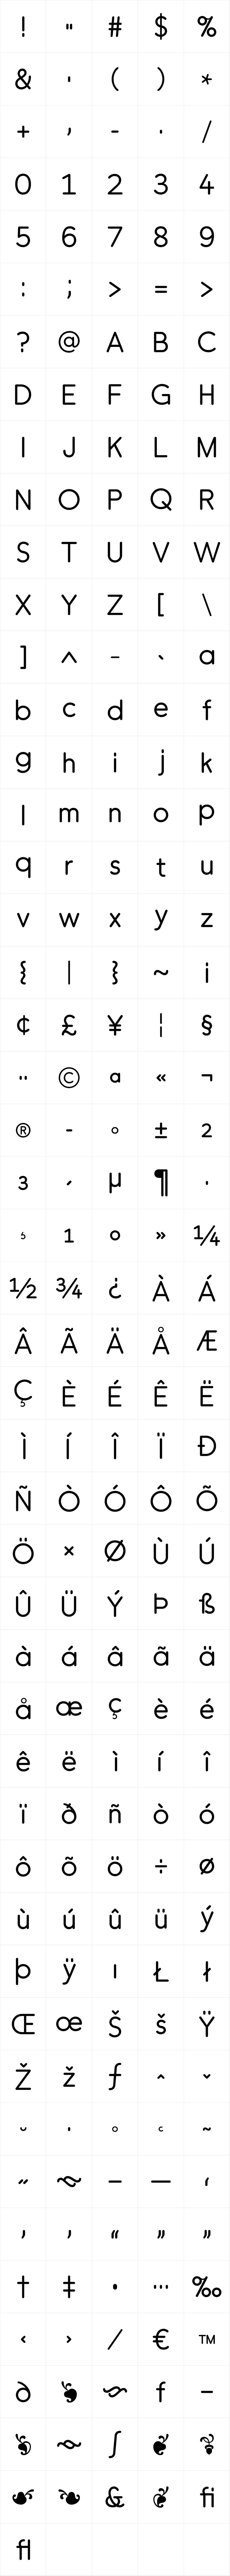 This Sans